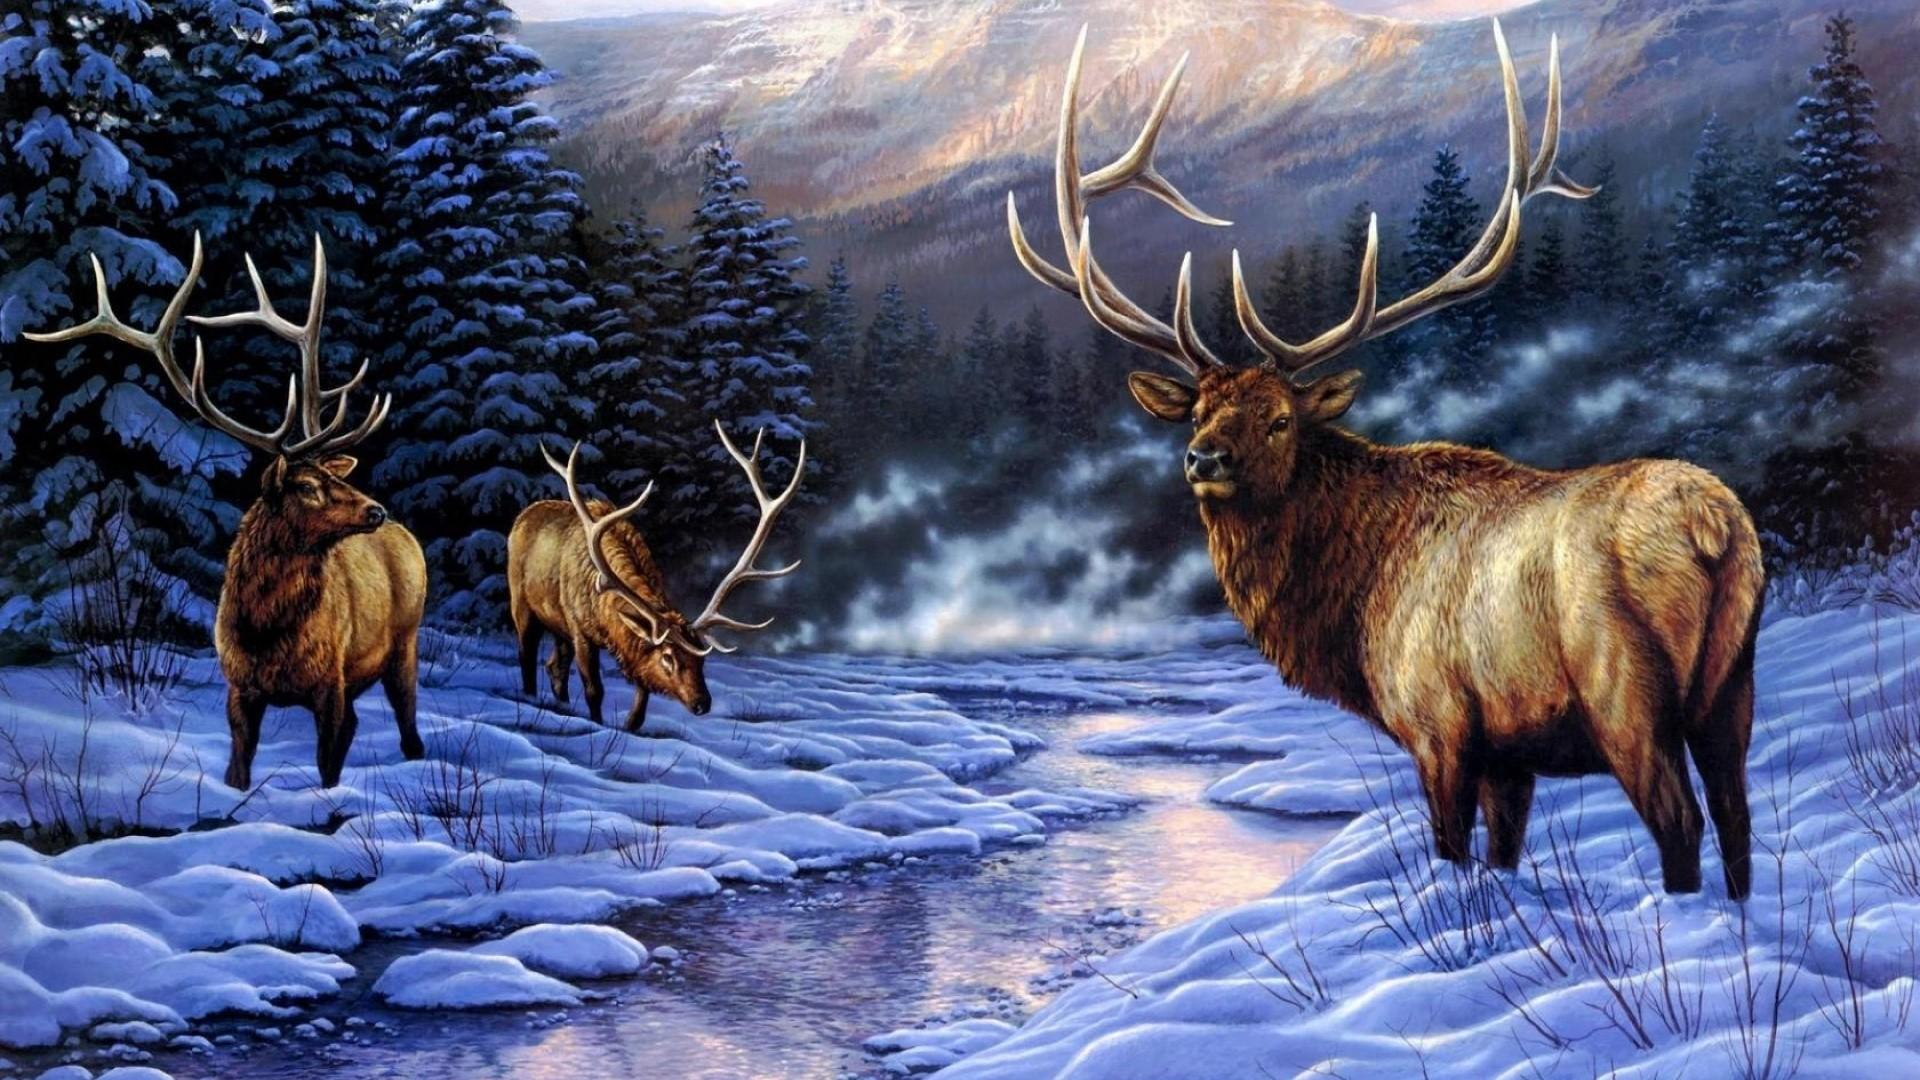 Elk hd wallpaper download